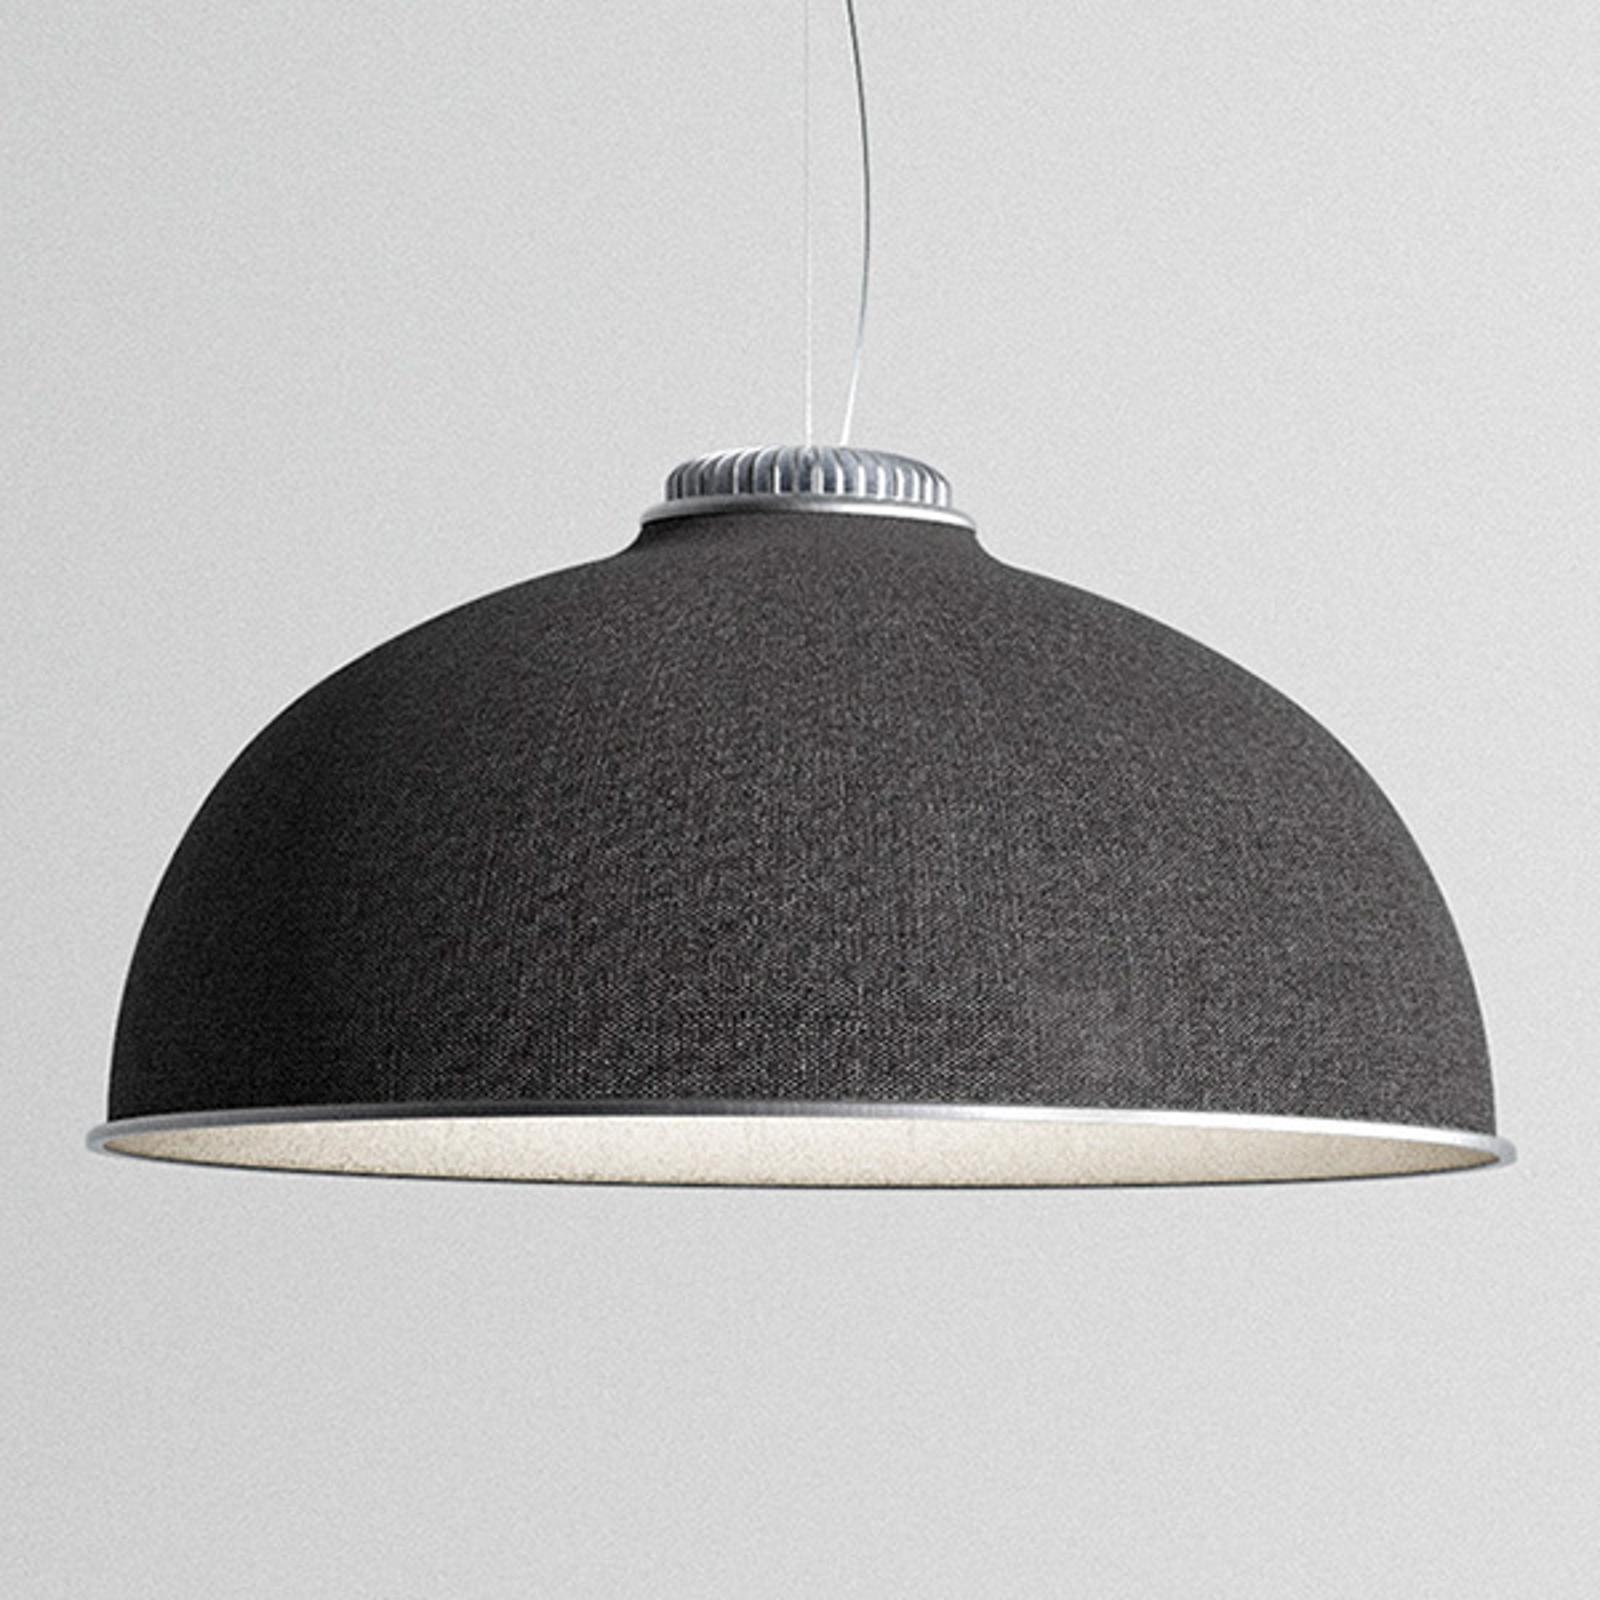 Luceplan Farel LED-Hängeleuchte Schirm dunkelgrau